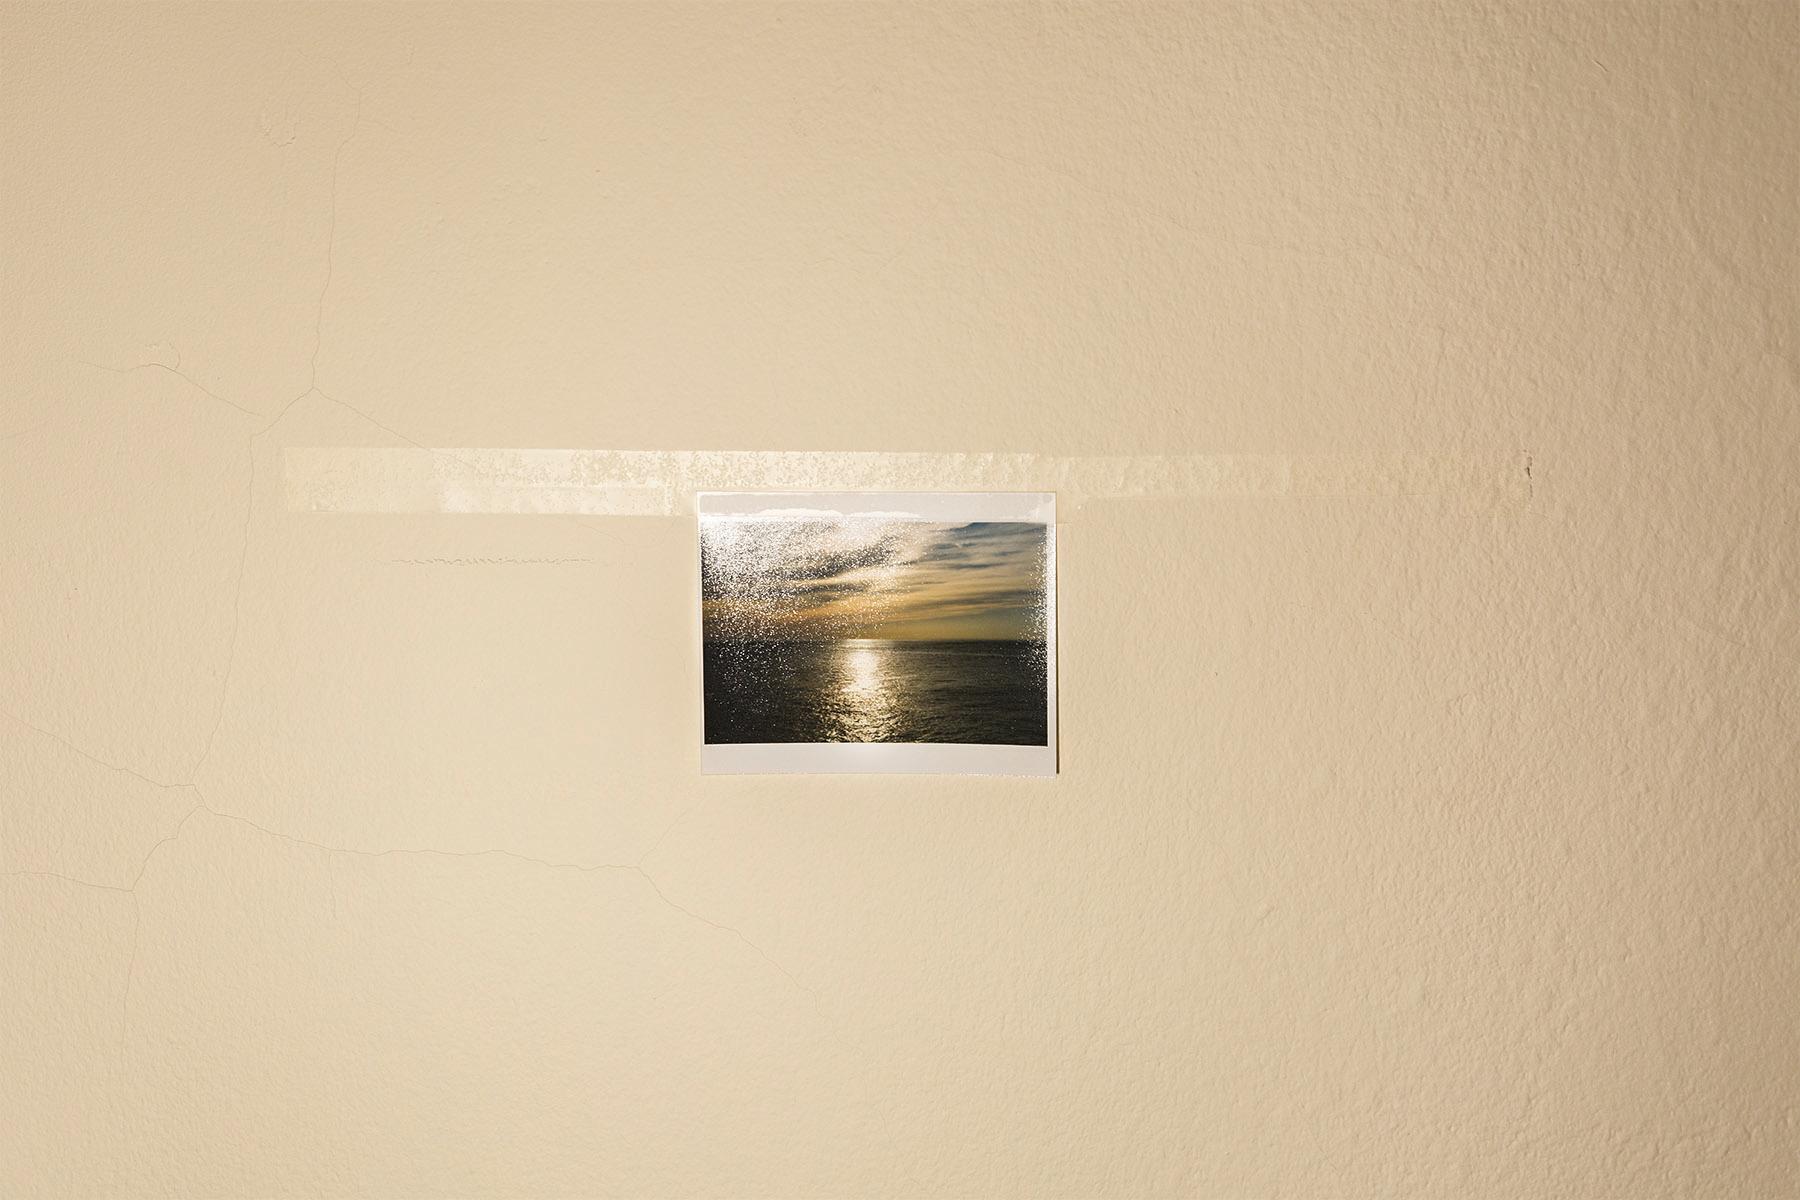 10 New Photographs #16.0